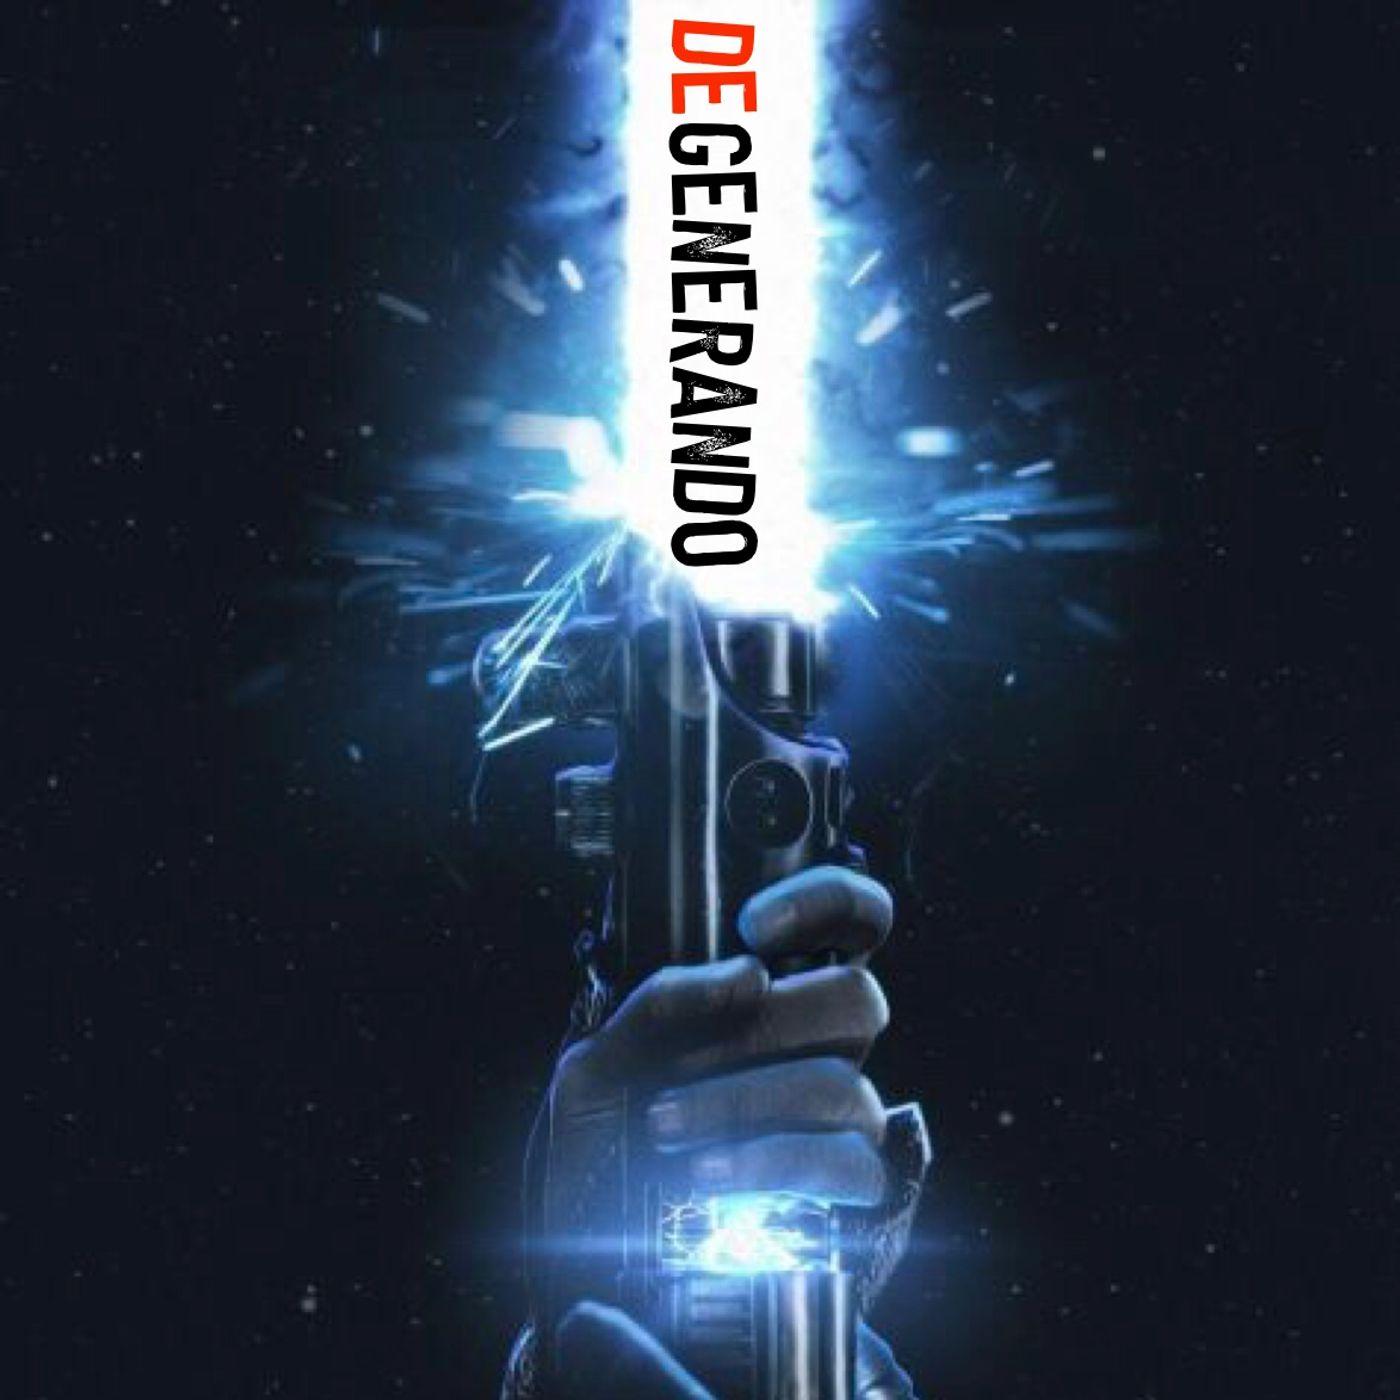 Star Wars Episodio IX - L'ascesa di Skywalker